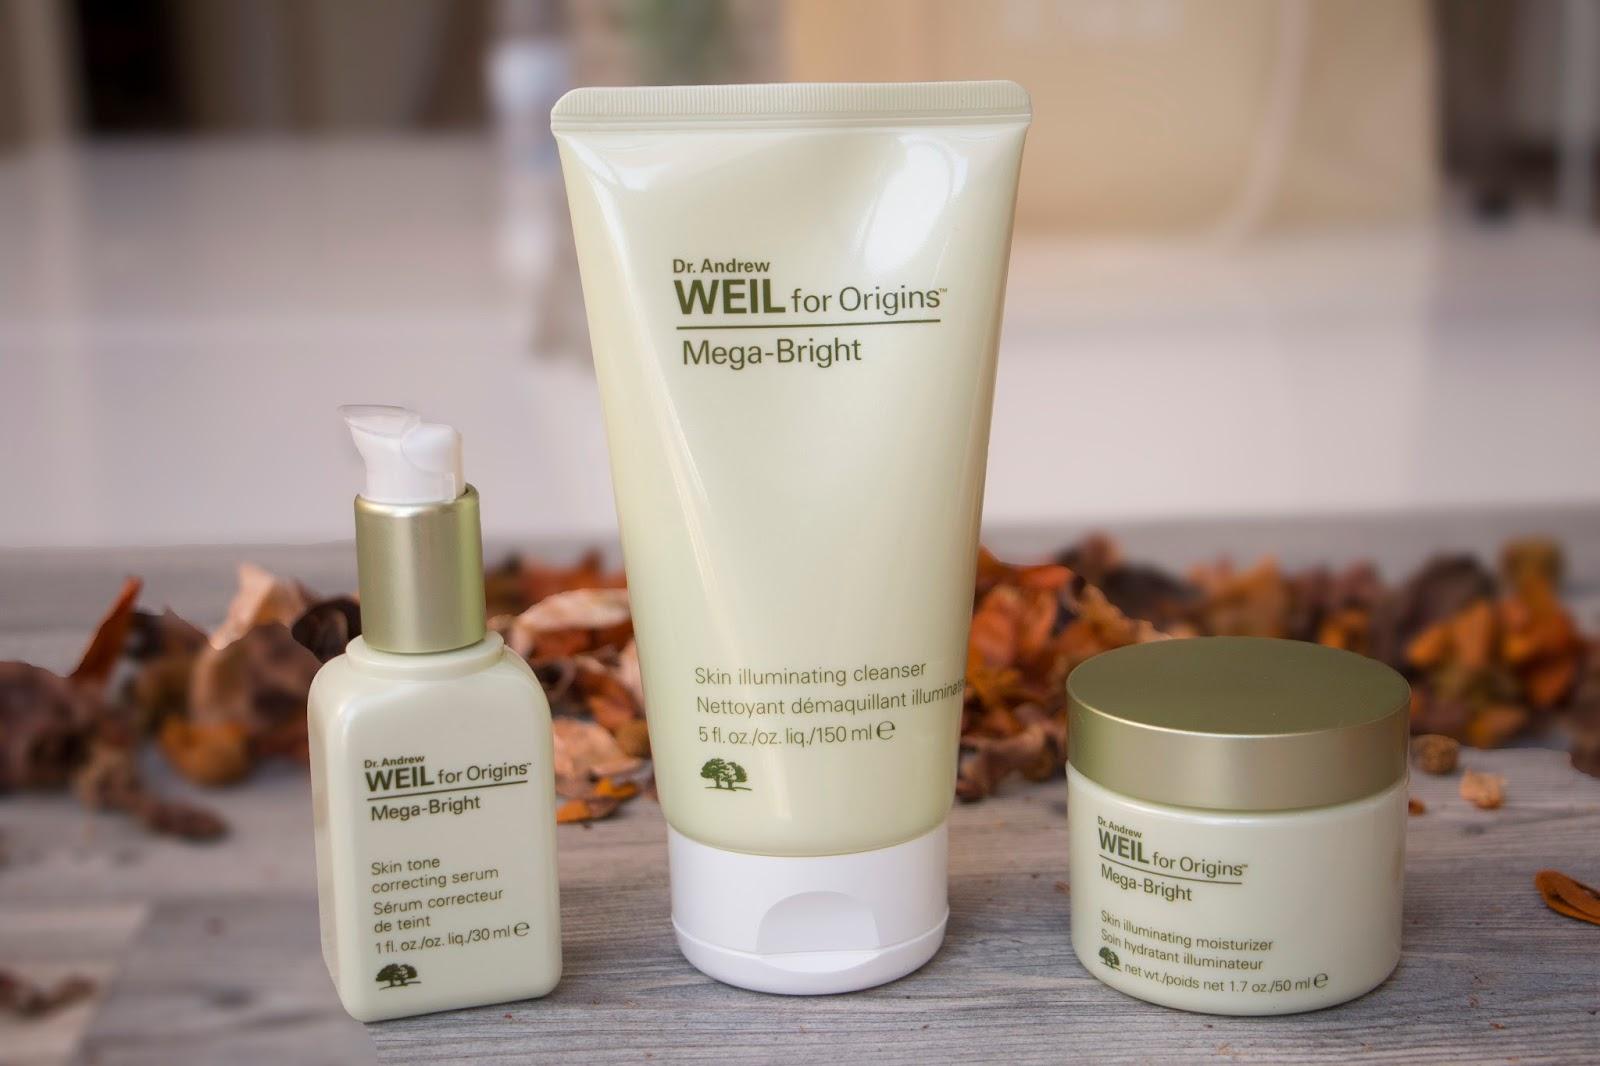 c8a6174a497dc Dr.Weil Mega Bright for Origins Skin Care